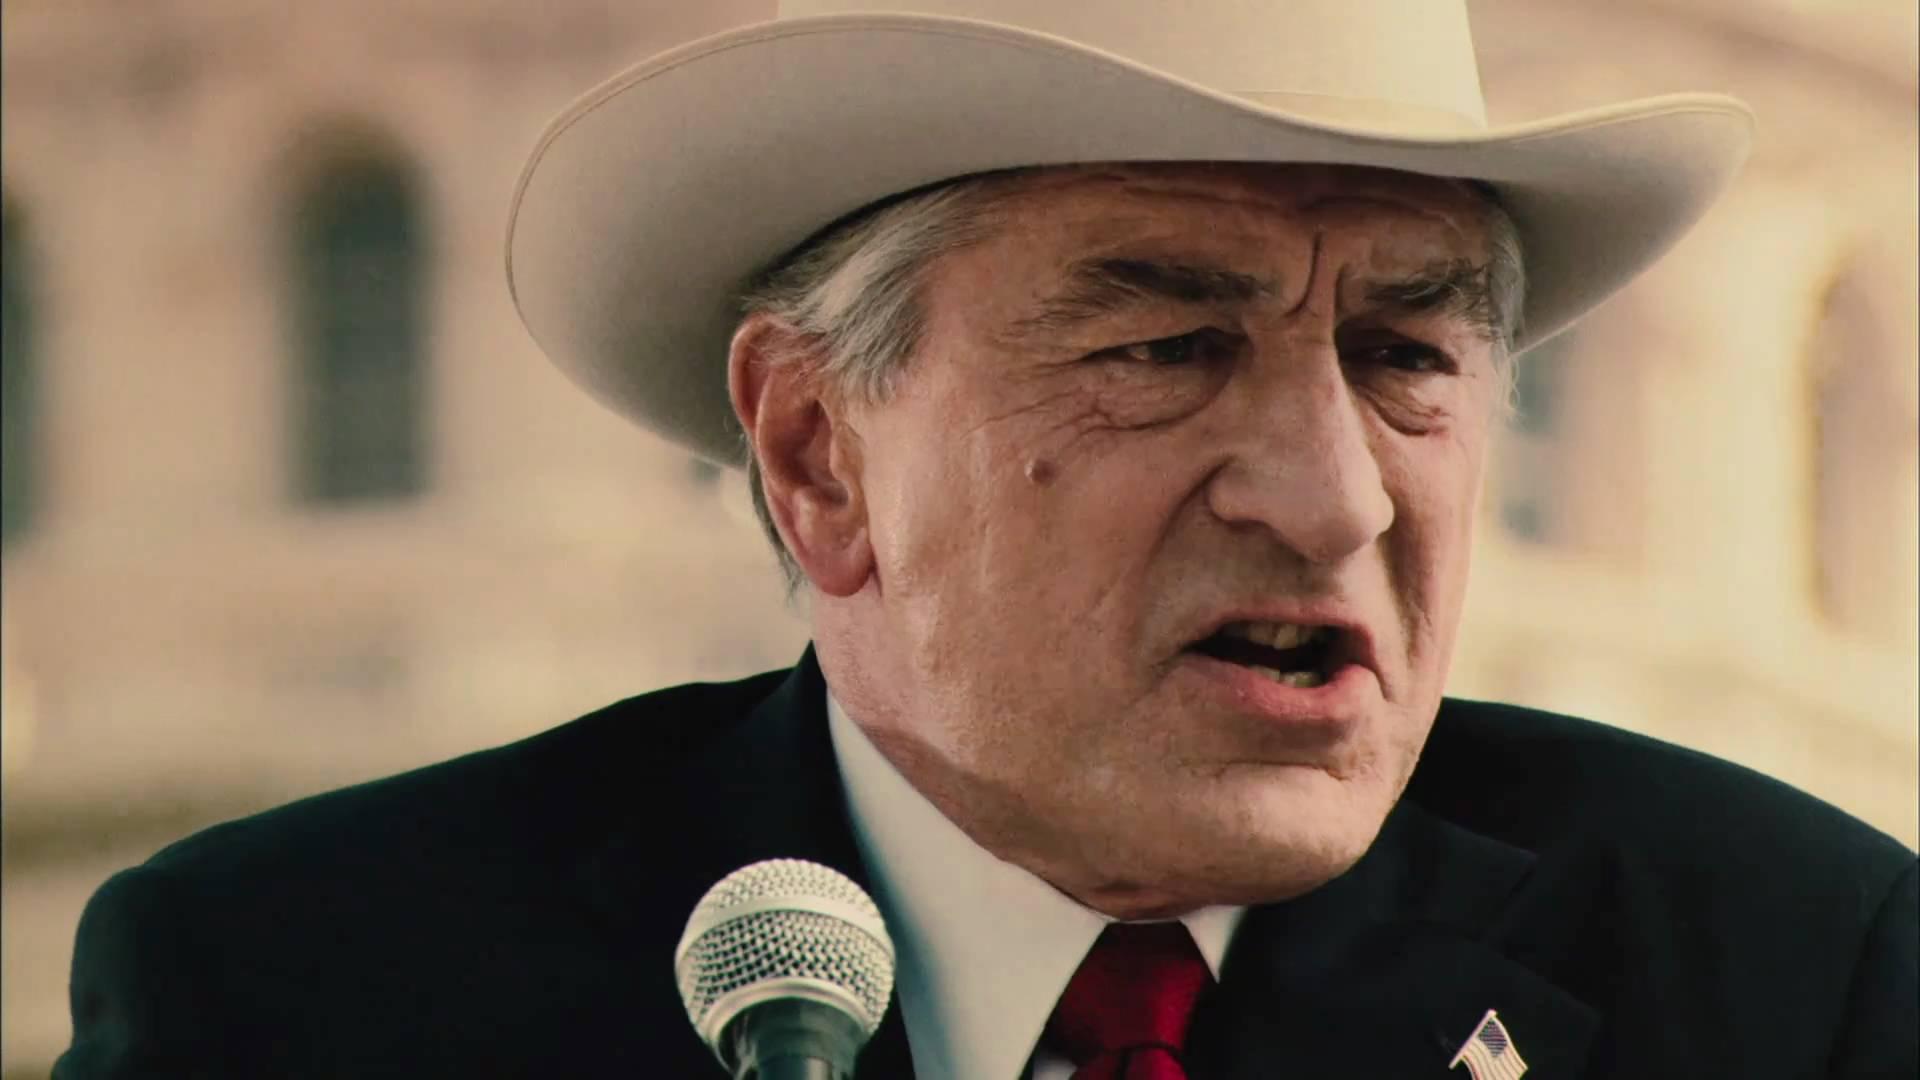 Robert De Niro as Senator McLaughlin in Machete